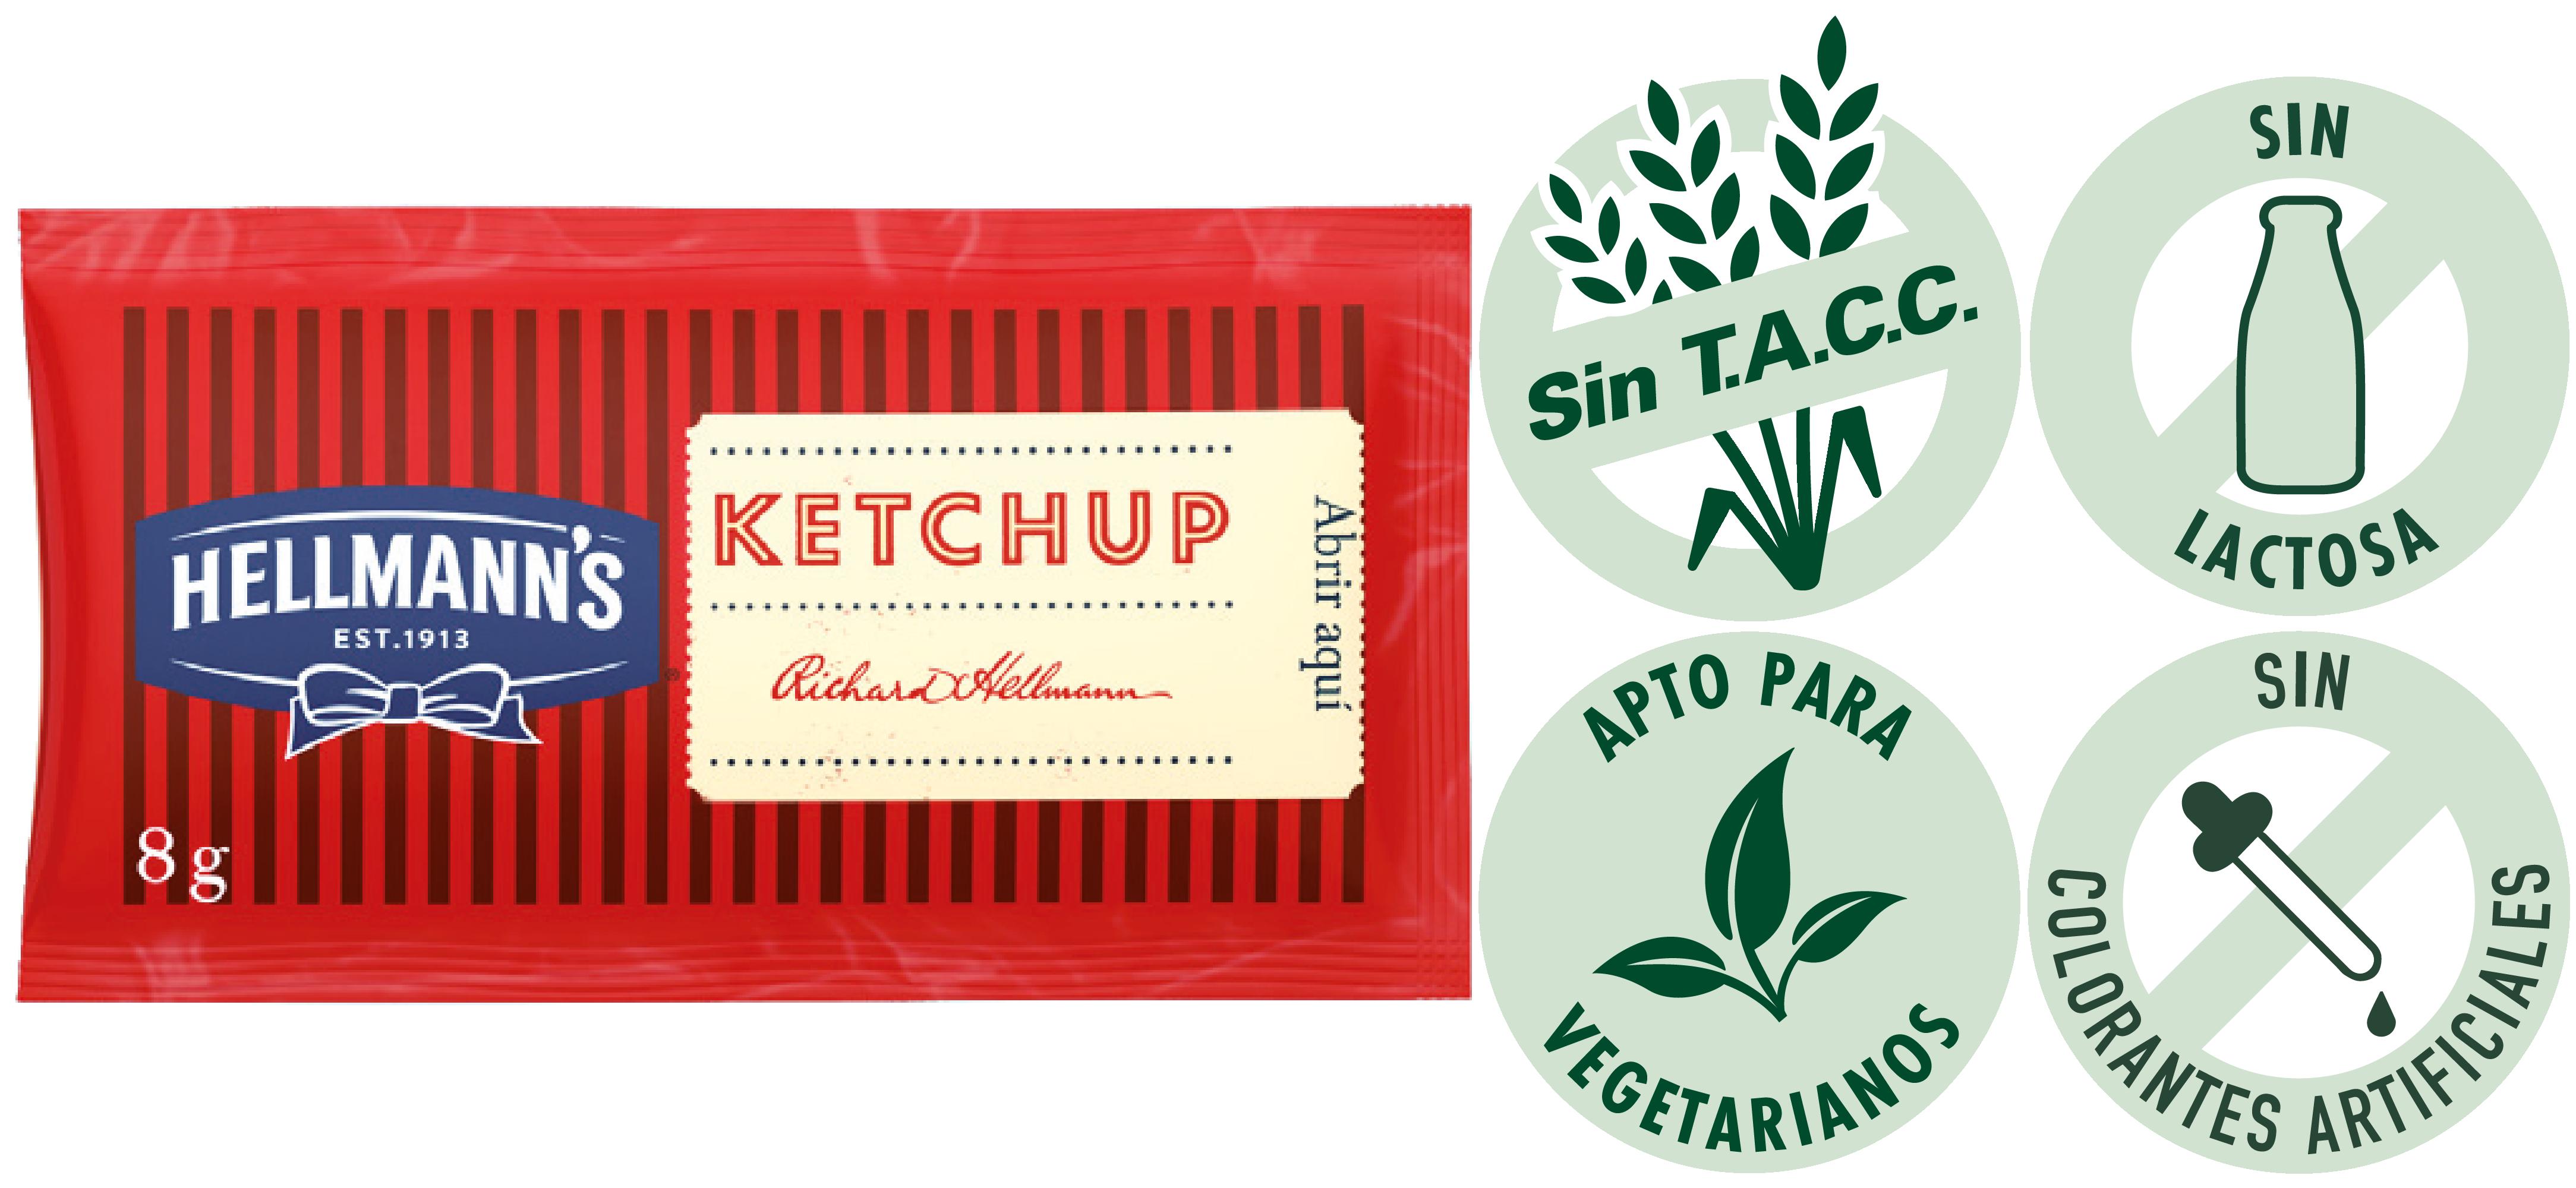 Ketchup Hellmann's 8g